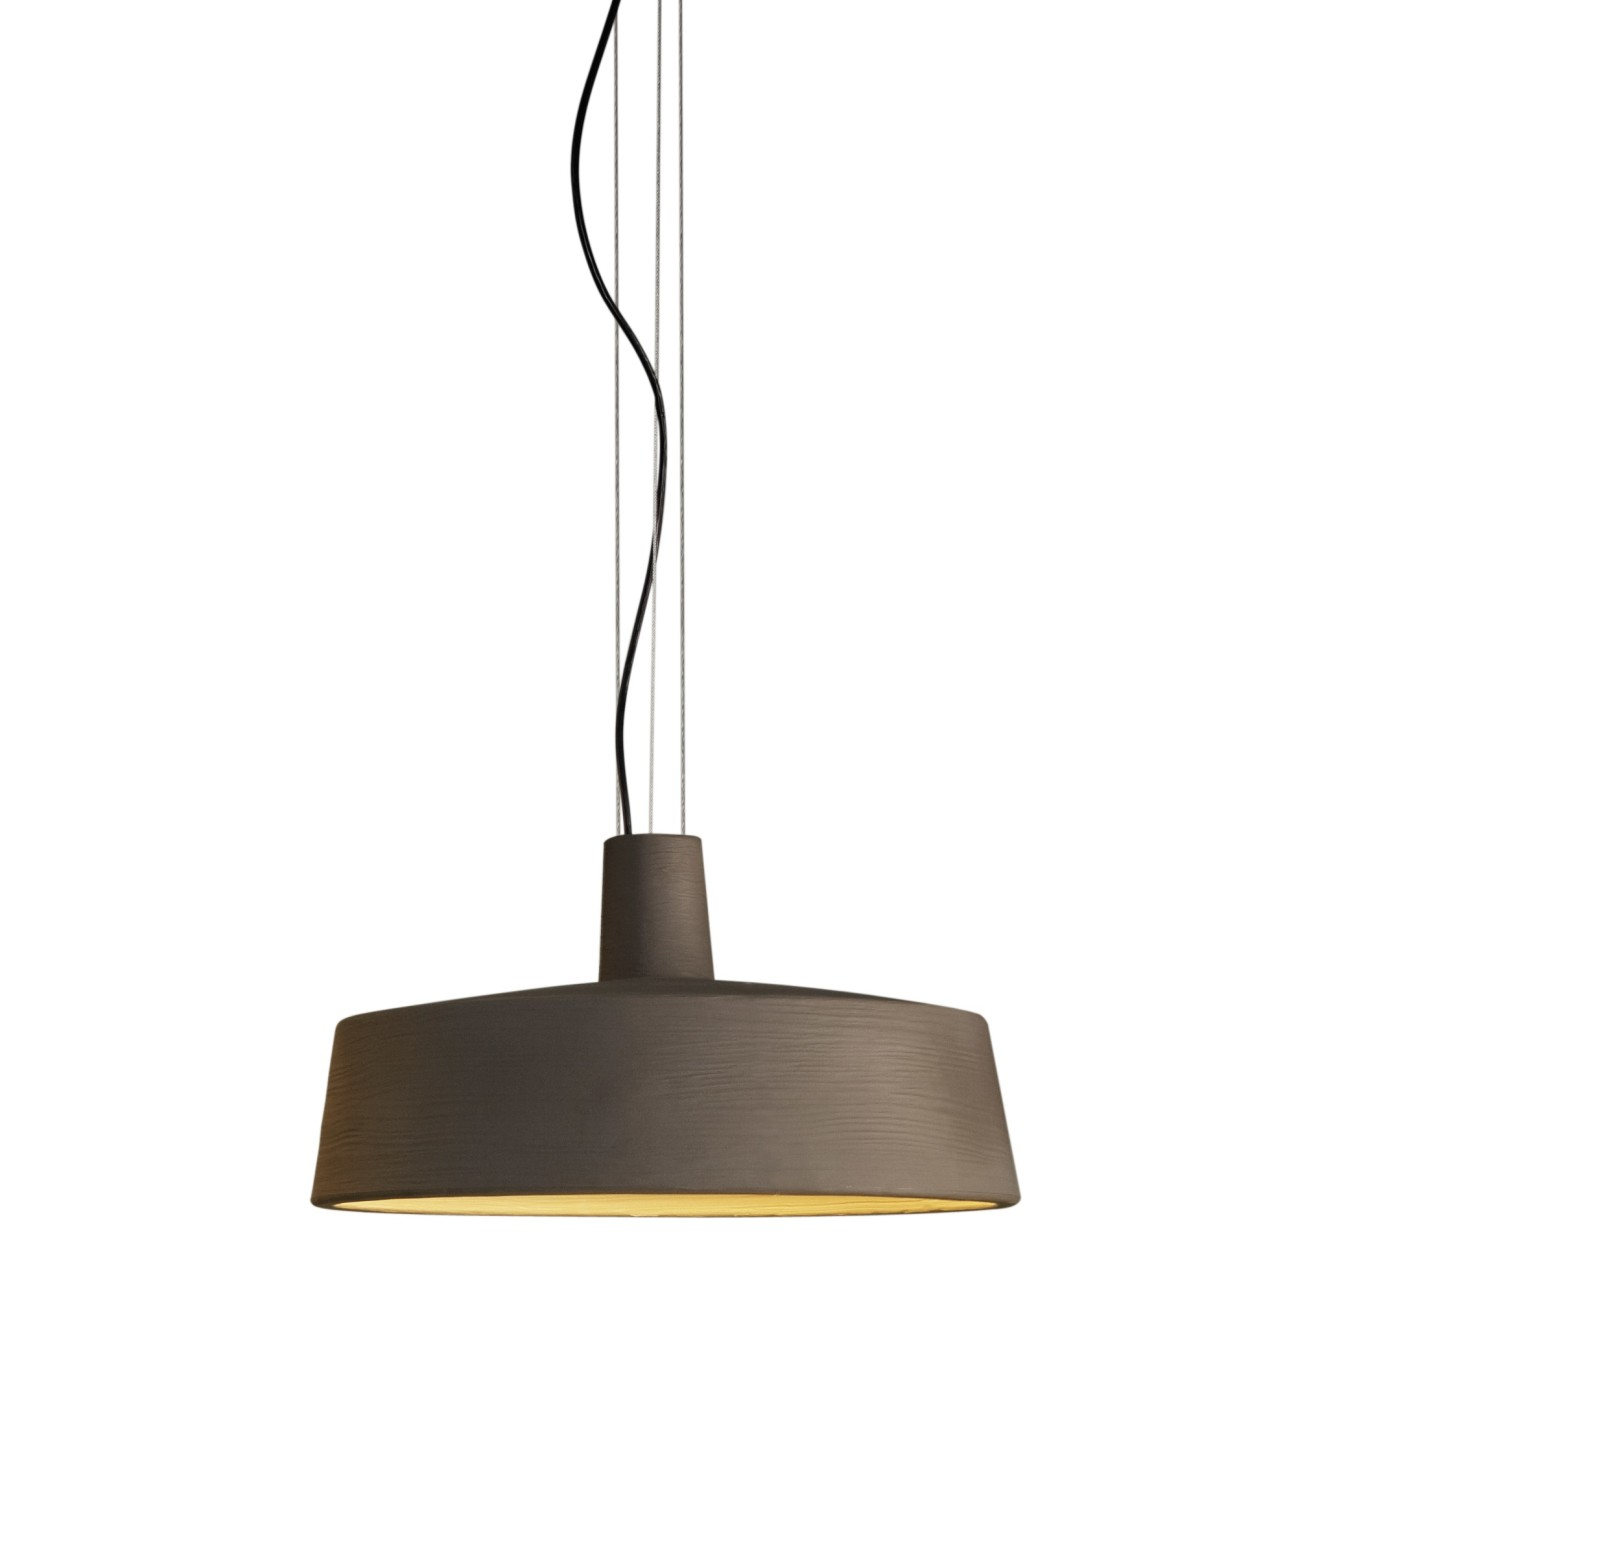 Soho Pendant Light - LED Marset - Stone Grey, Triac